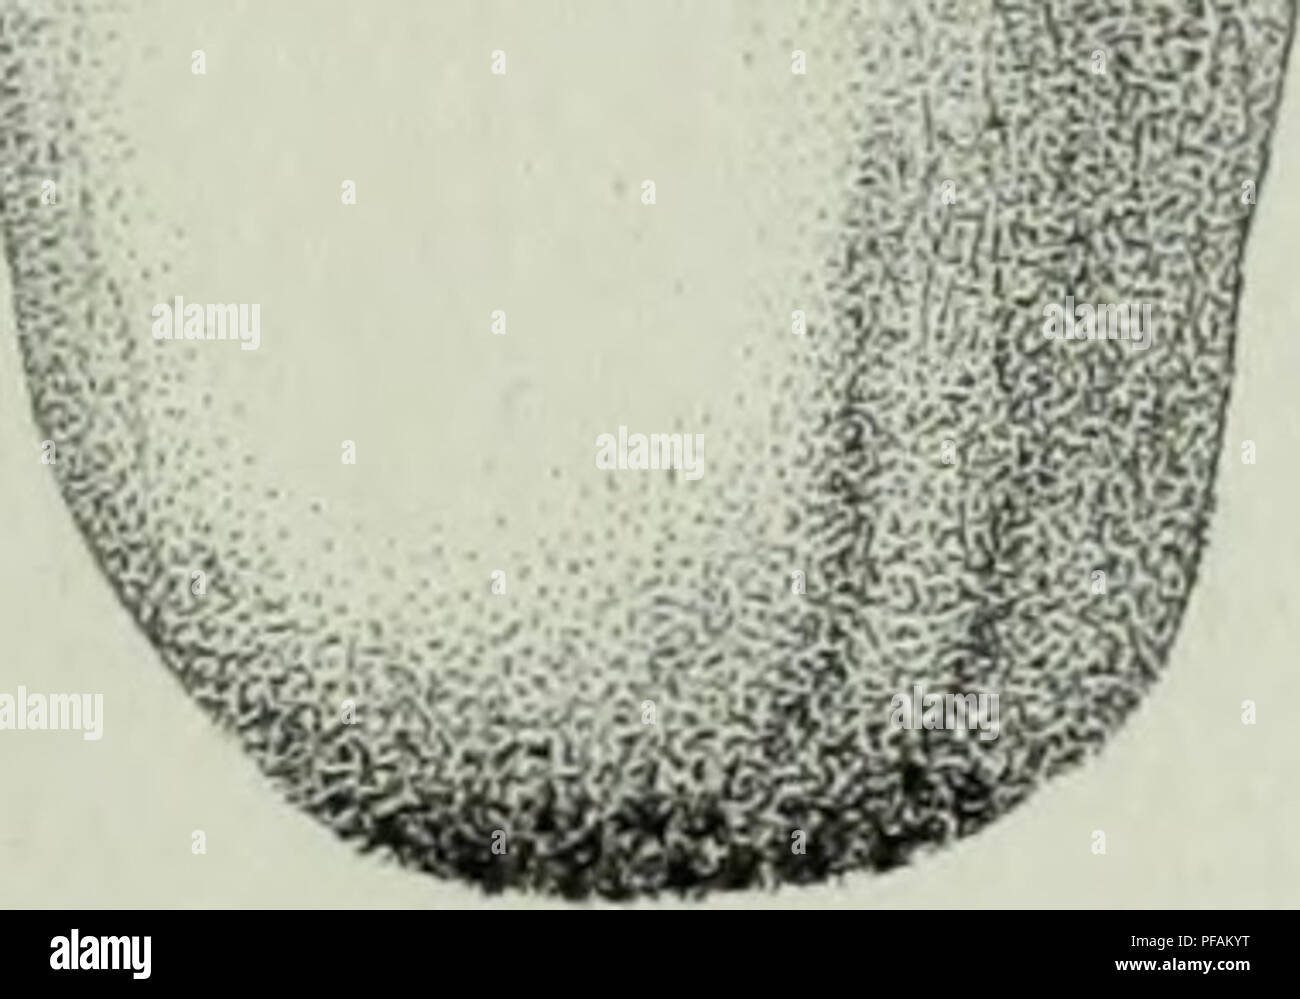 . Descrizione dei funghi mangerecci più comuni dell'Italia e de' velenosi che possono co' medesimi confondersi. Fungi; Mushrooms. m&5 ^ *-*. - ag flfflfl v#'/ Fi9.n1.. Please note that these images are extracted from scanned page images that may have been digitally enhanced for readability - coloration and appearance of these illustrations may not perfectly resemble the original work.. Vittadini, Carlo; Cavagna Sangiuliani di Gualdana, Antonio, conte, 1843-1913, former owner. IU-R. Milano, Rusconi - Stock Image